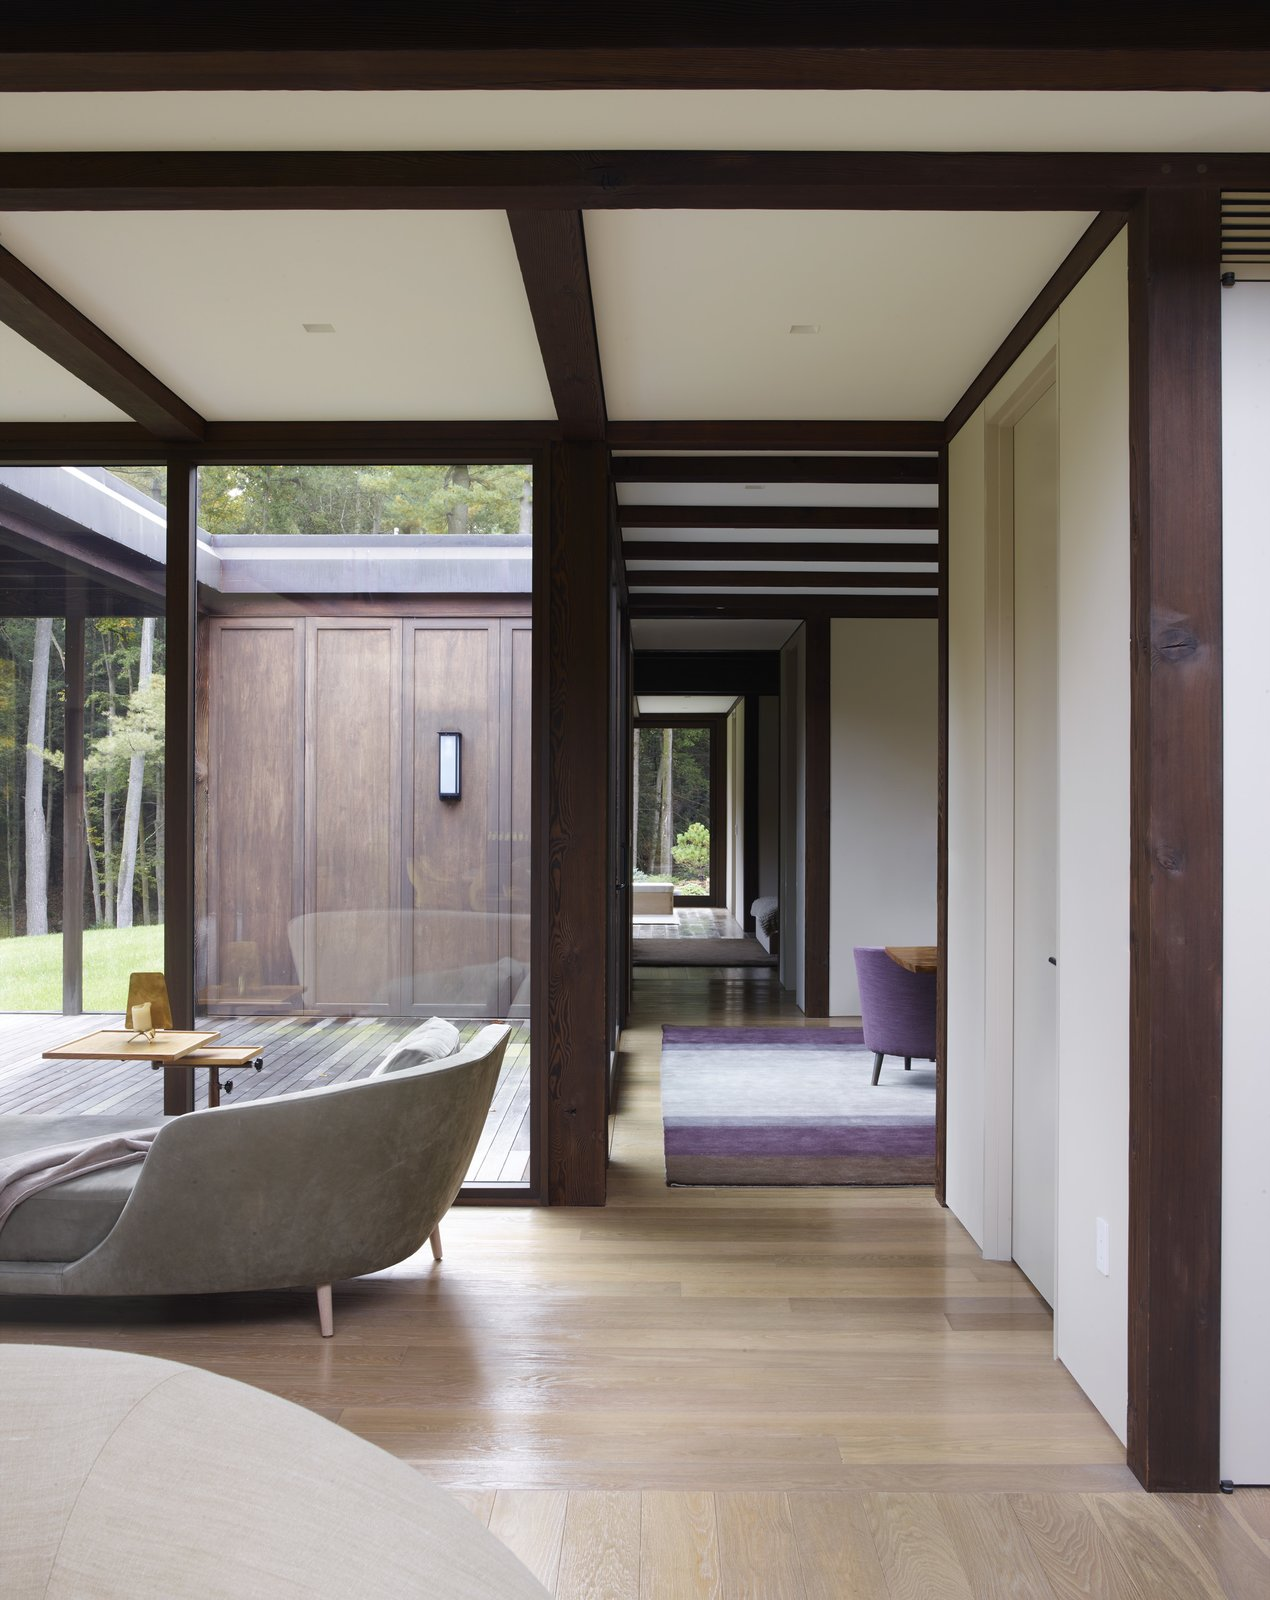 Hallway and Medium Hardwood Floor  Photo 3 of 15 in Feast Your Eyes on Fashion Designer Josie Natori's Japanese-Inspired Home